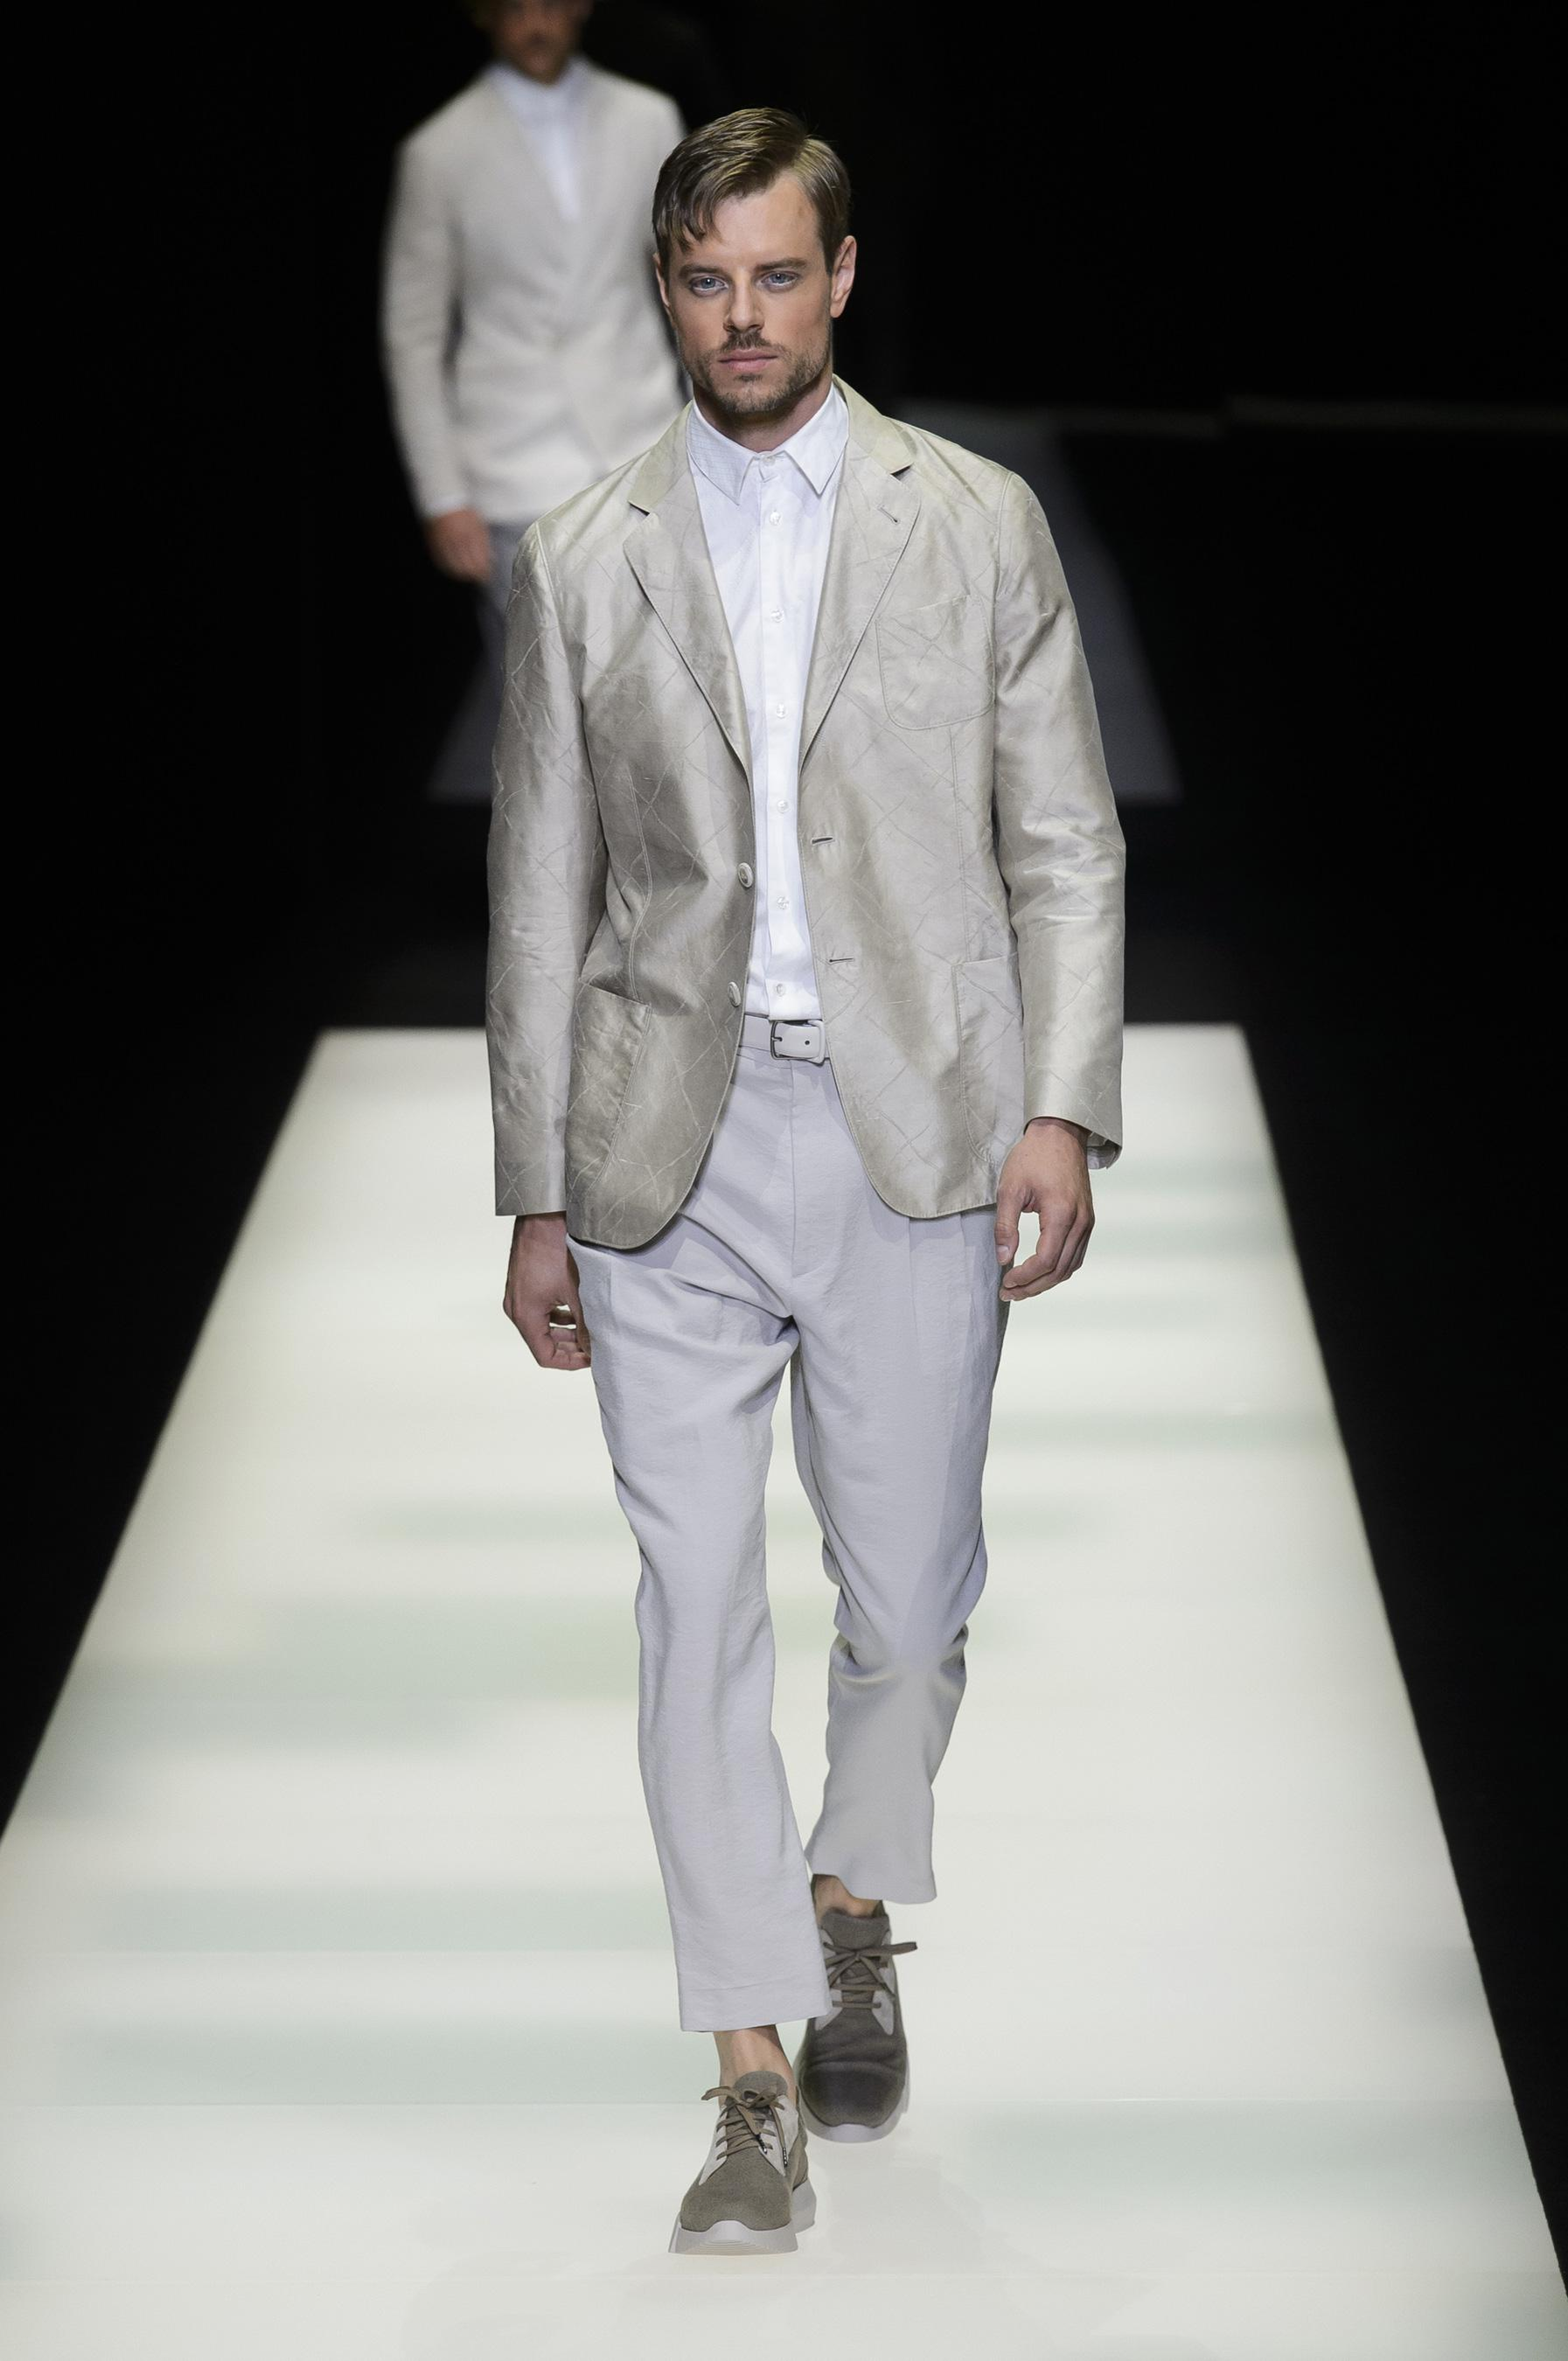 Giorgio Armani весна лето 2018 мужской белый костюм